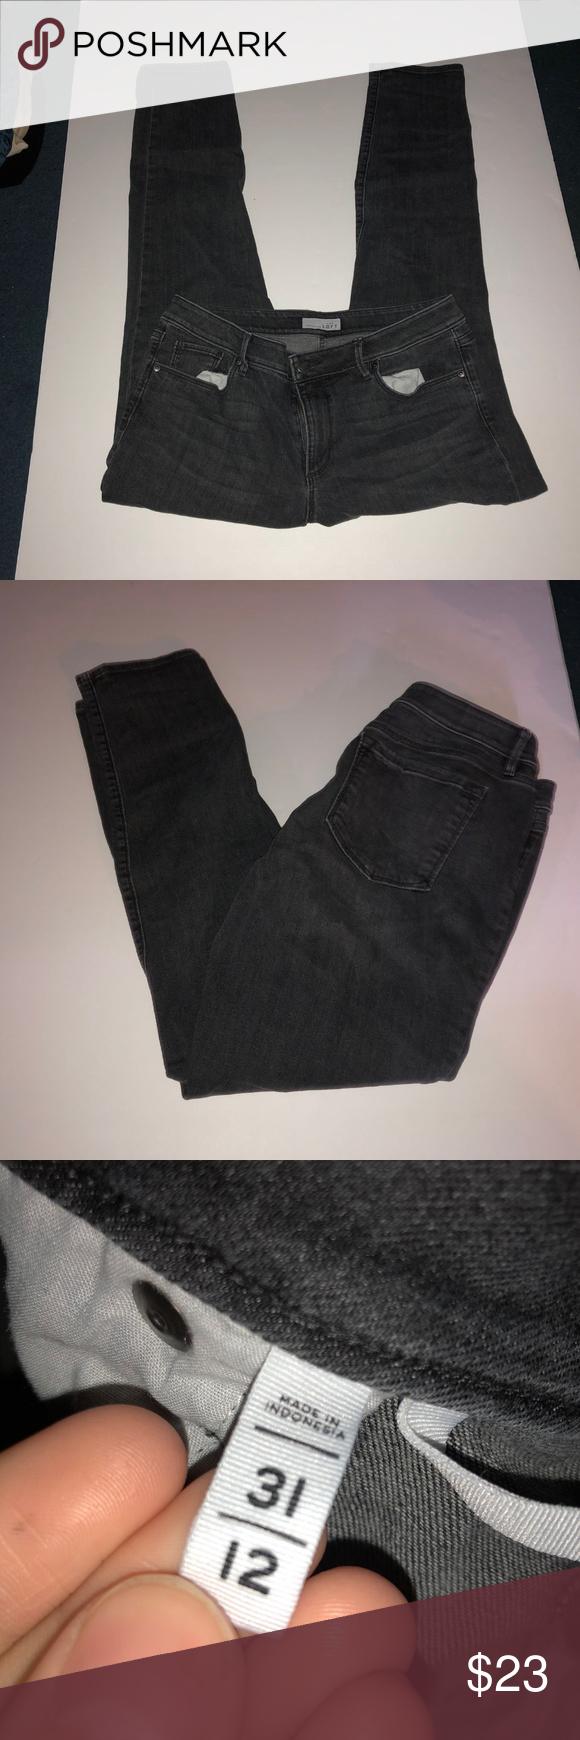 Woman Jeans amazing woman jeans size 12